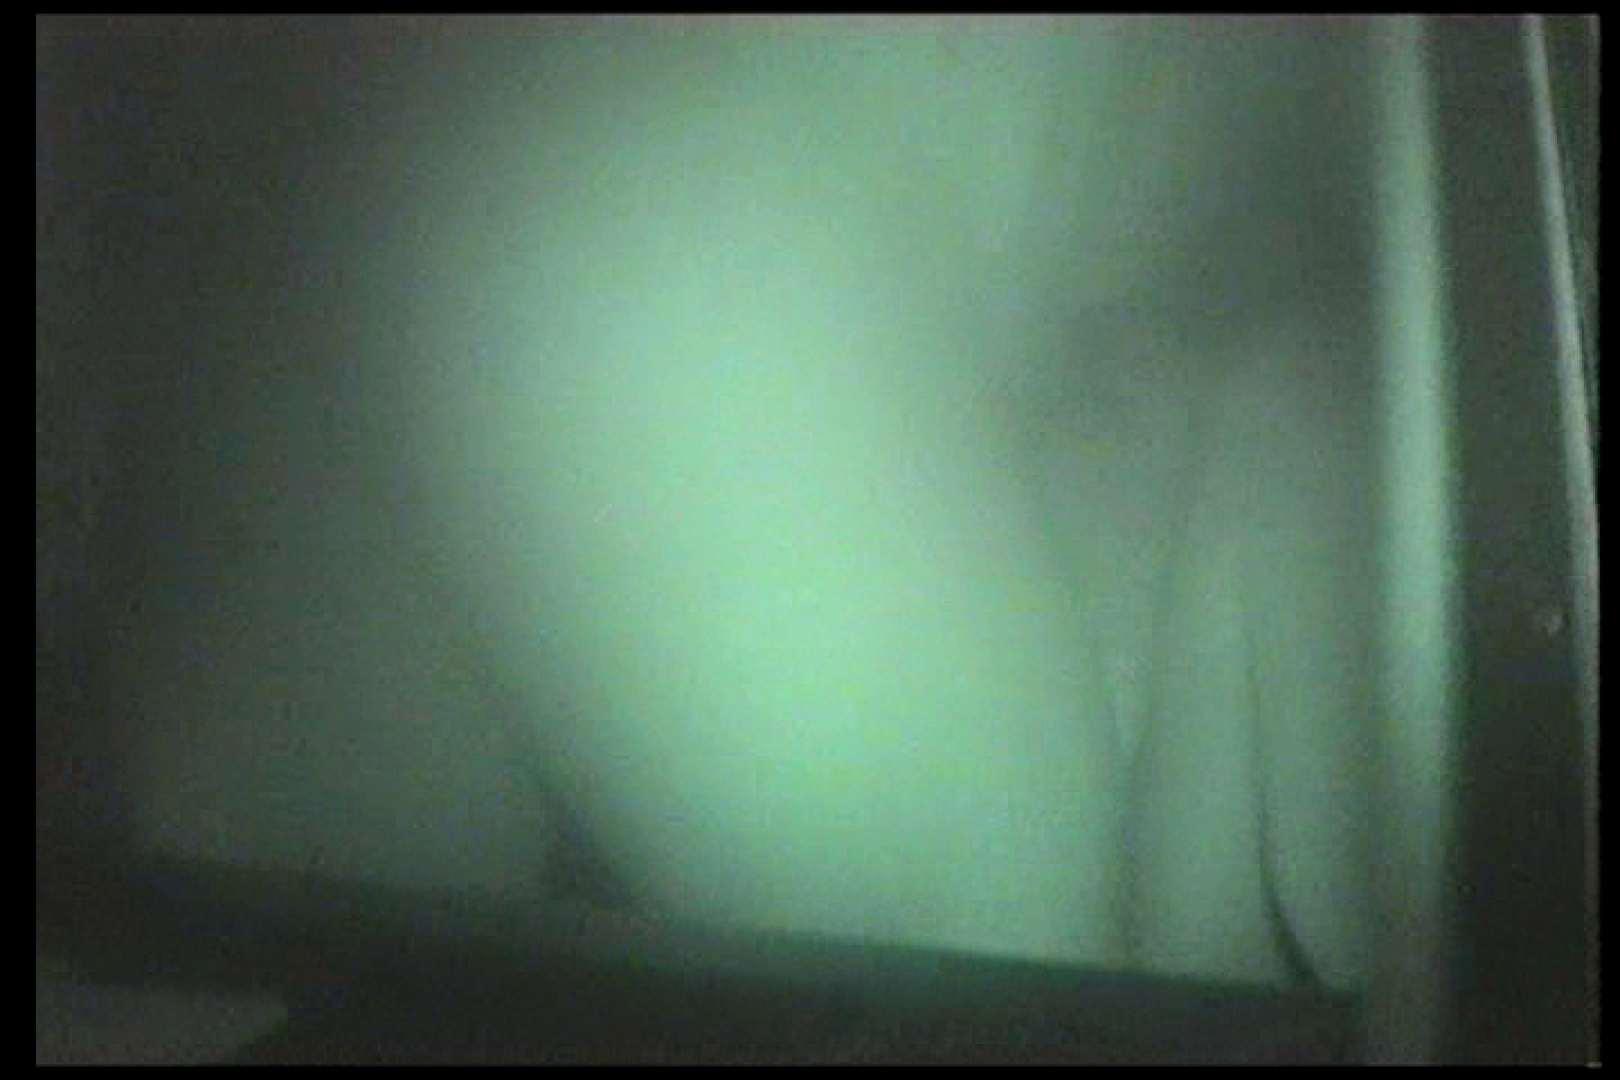 カーセックス未編集・無修正版 Vol.6後編 美女OL 濡れ場動画紹介 76連発 50